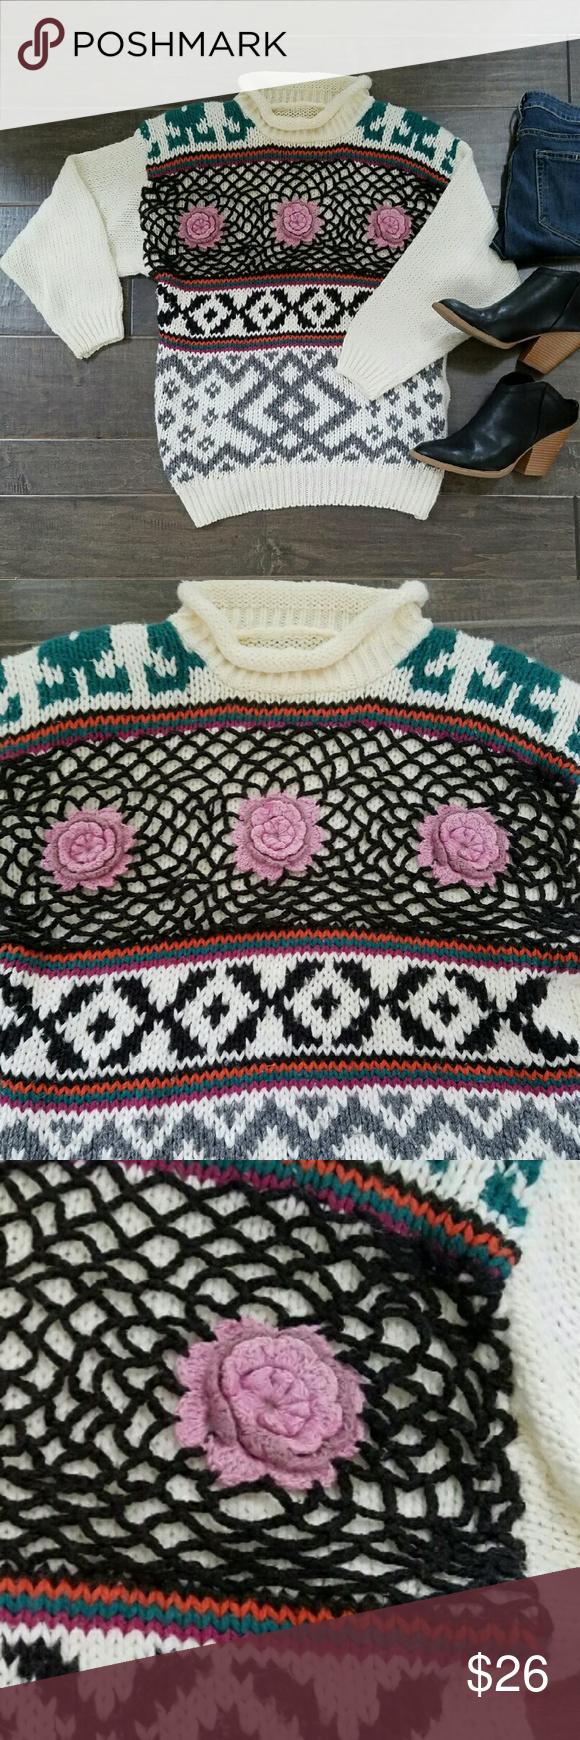 Dorable Fair Isle Crochet Pattern Vignette - Sewing Pattern for ...